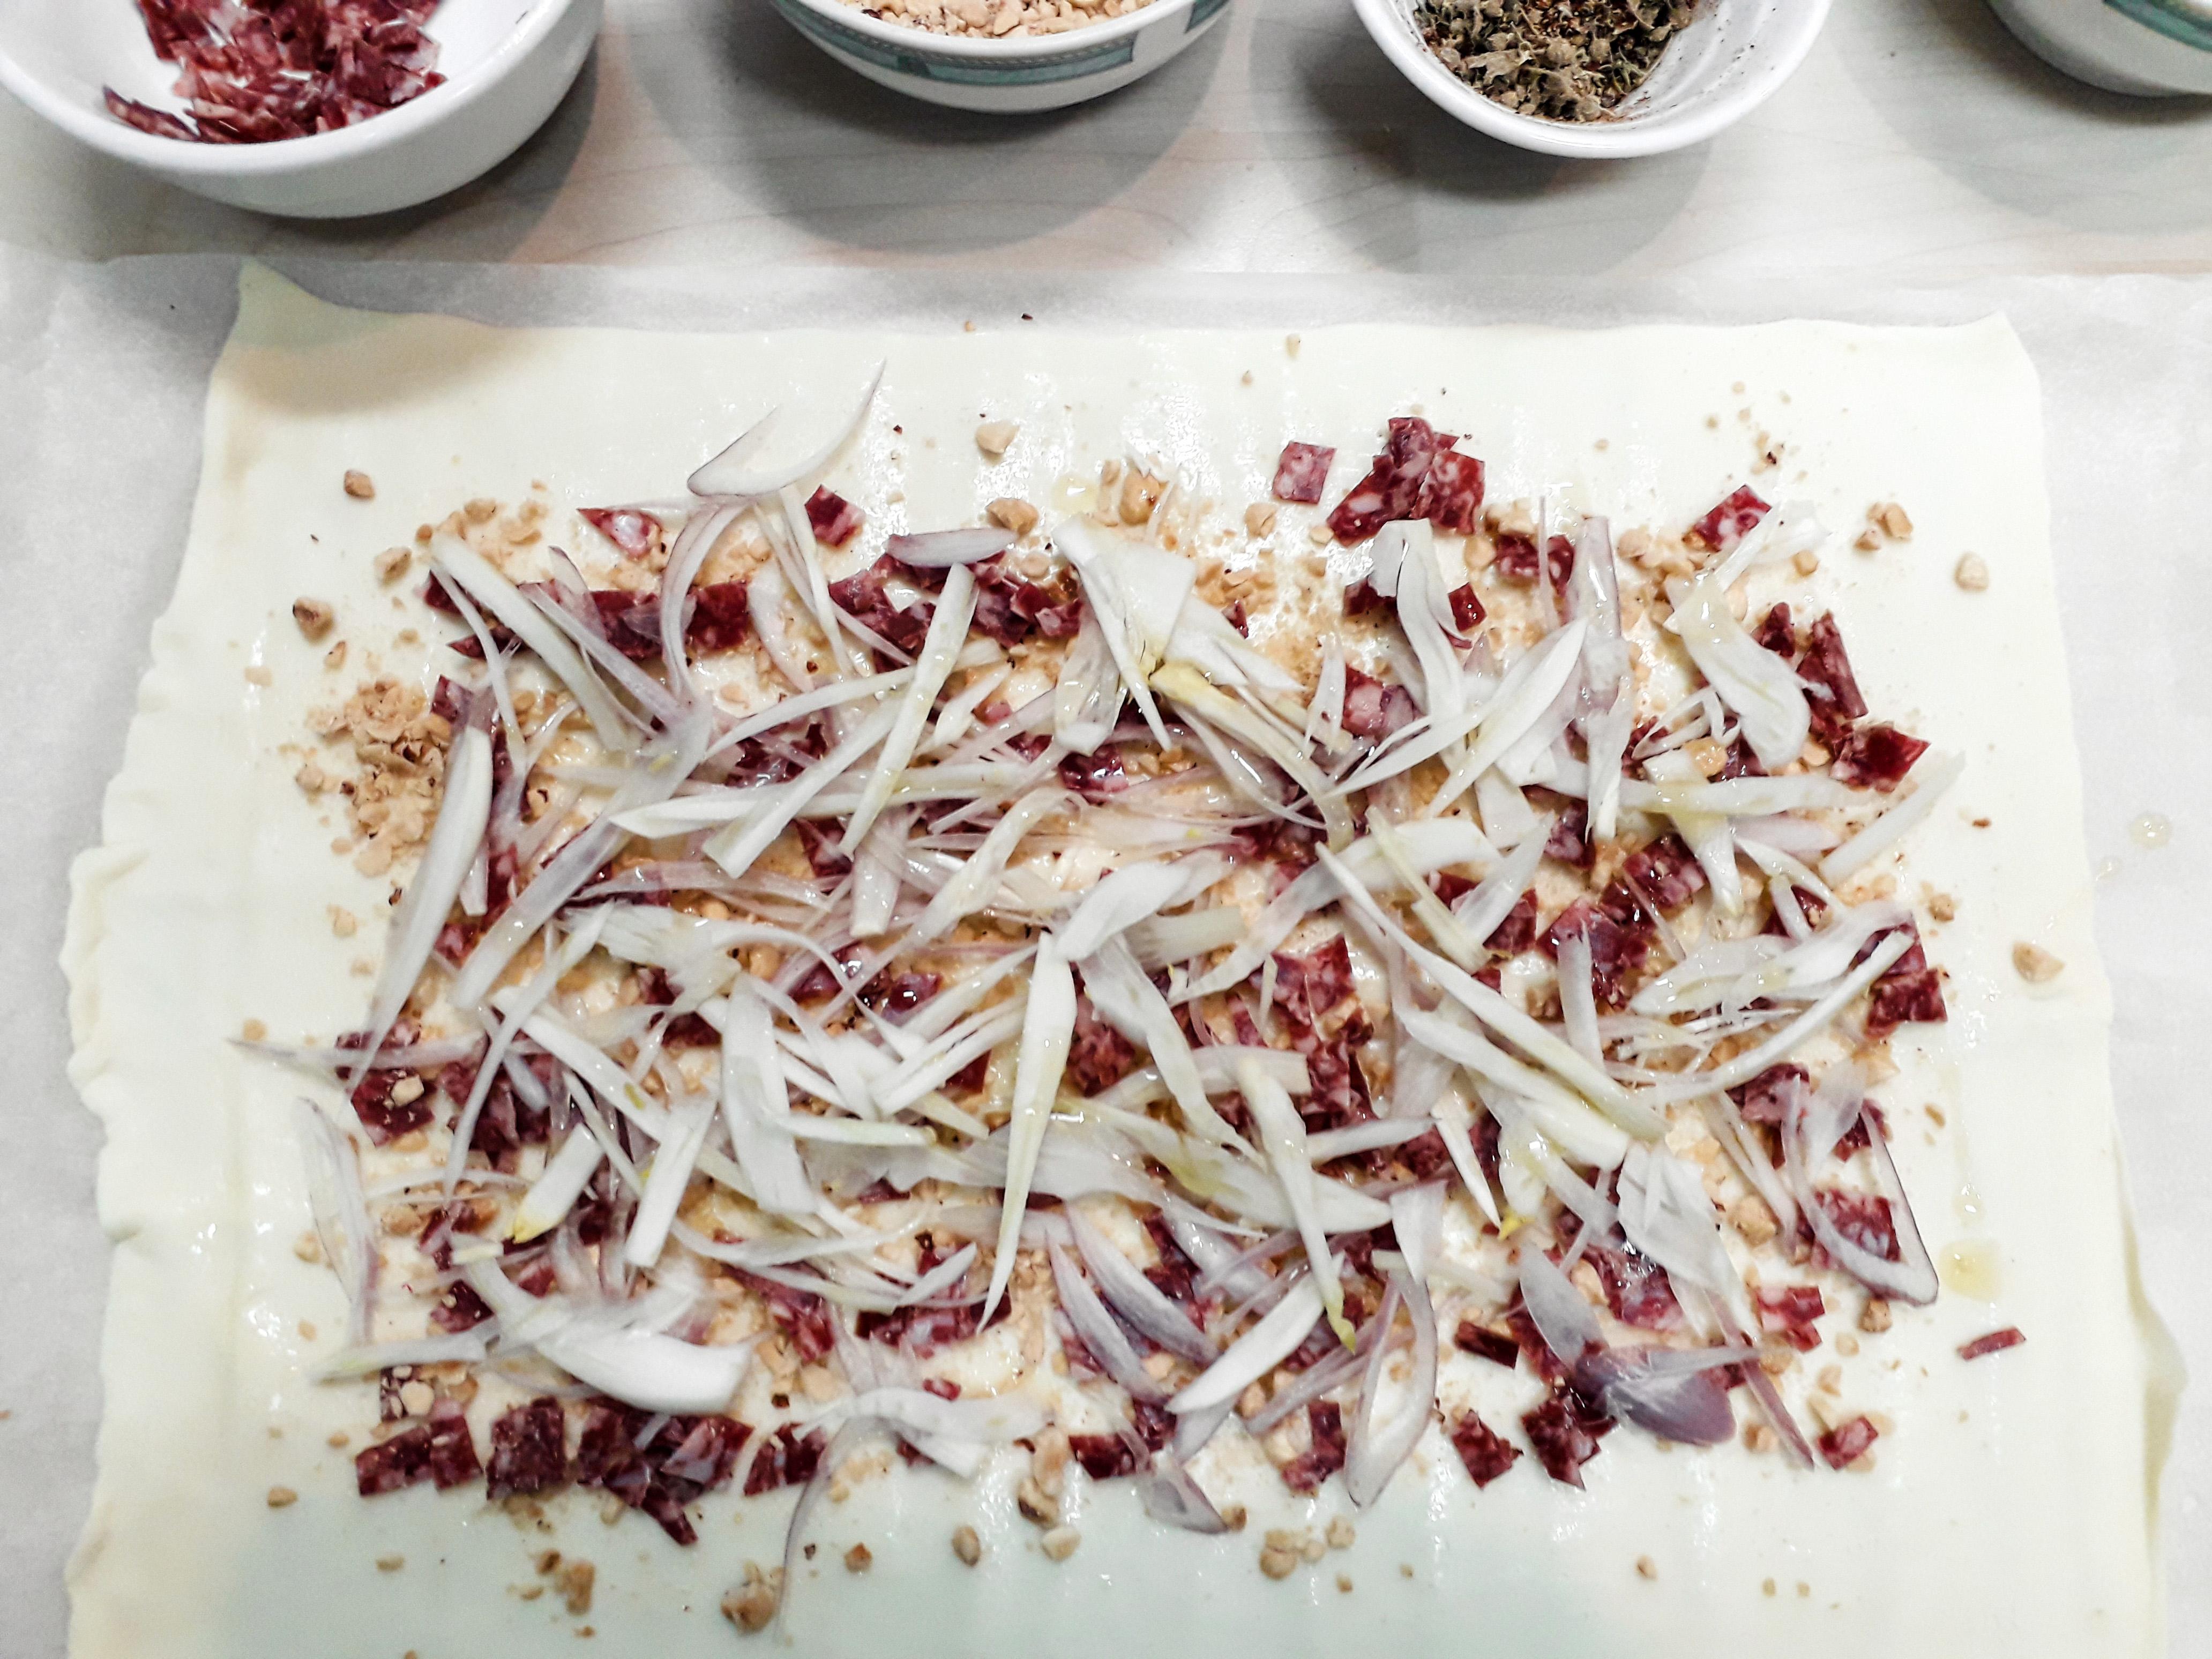 Receta Pizza Salmón Ahumado Hinojo Aceite Mandarina Zaatar Cilantro Afuegolento 16 12 20